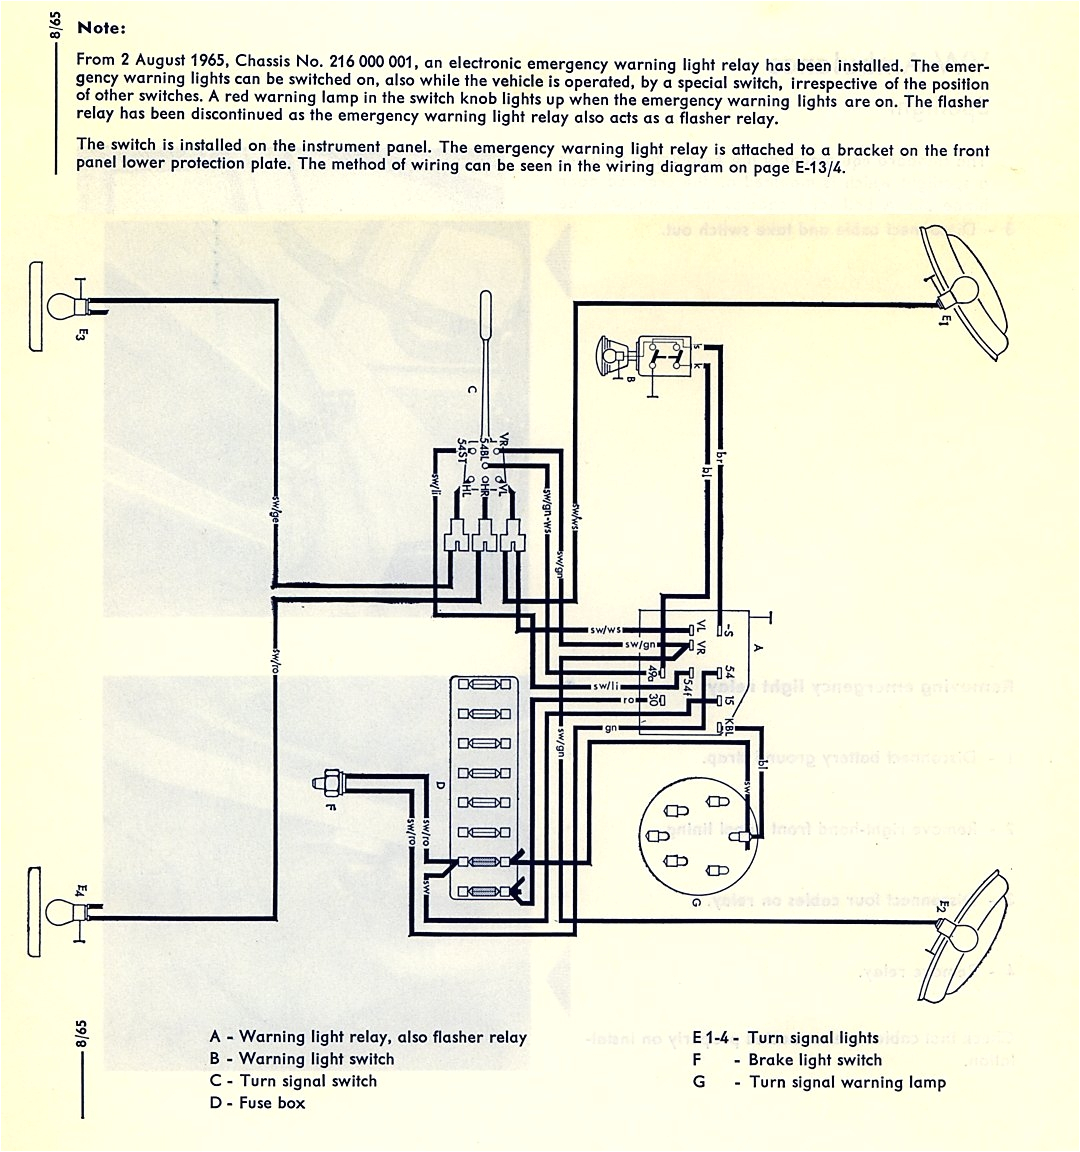 signal light flasher wiring diagram elegant turn signal wiring diagram lovely jcb 3 0d 4